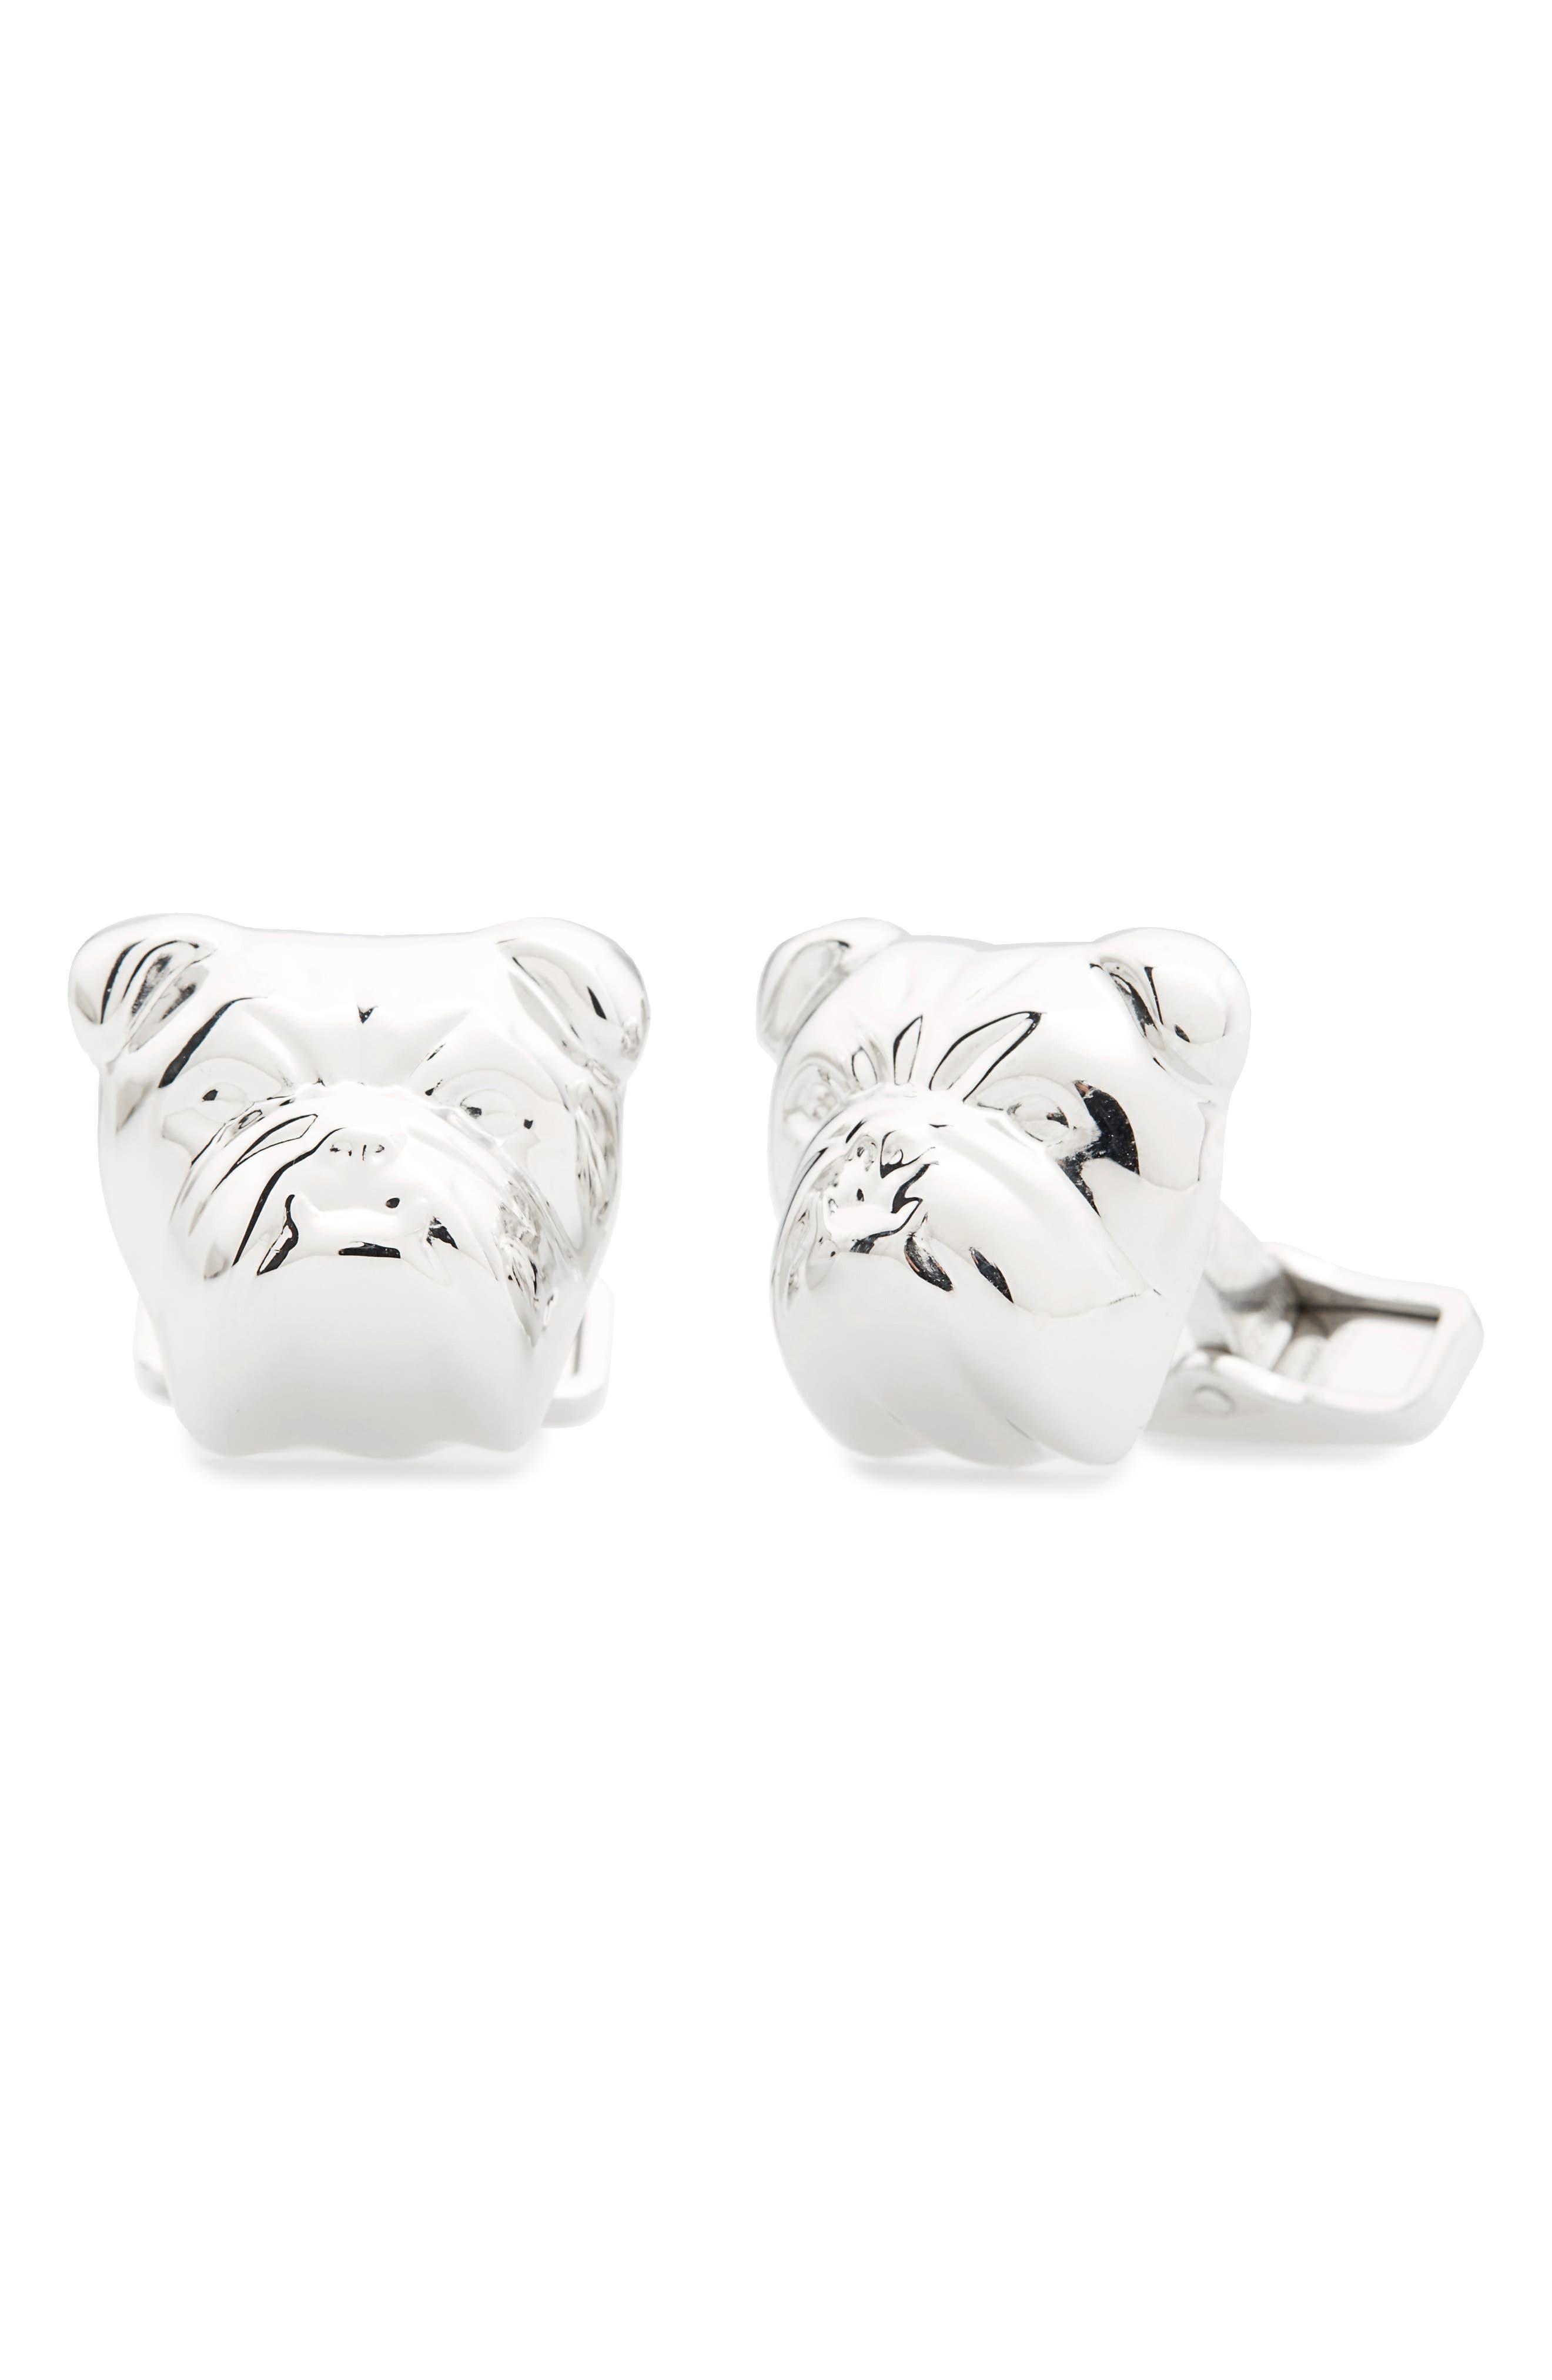 Bulldog Cuff Links,                         Main,                         color, Silver